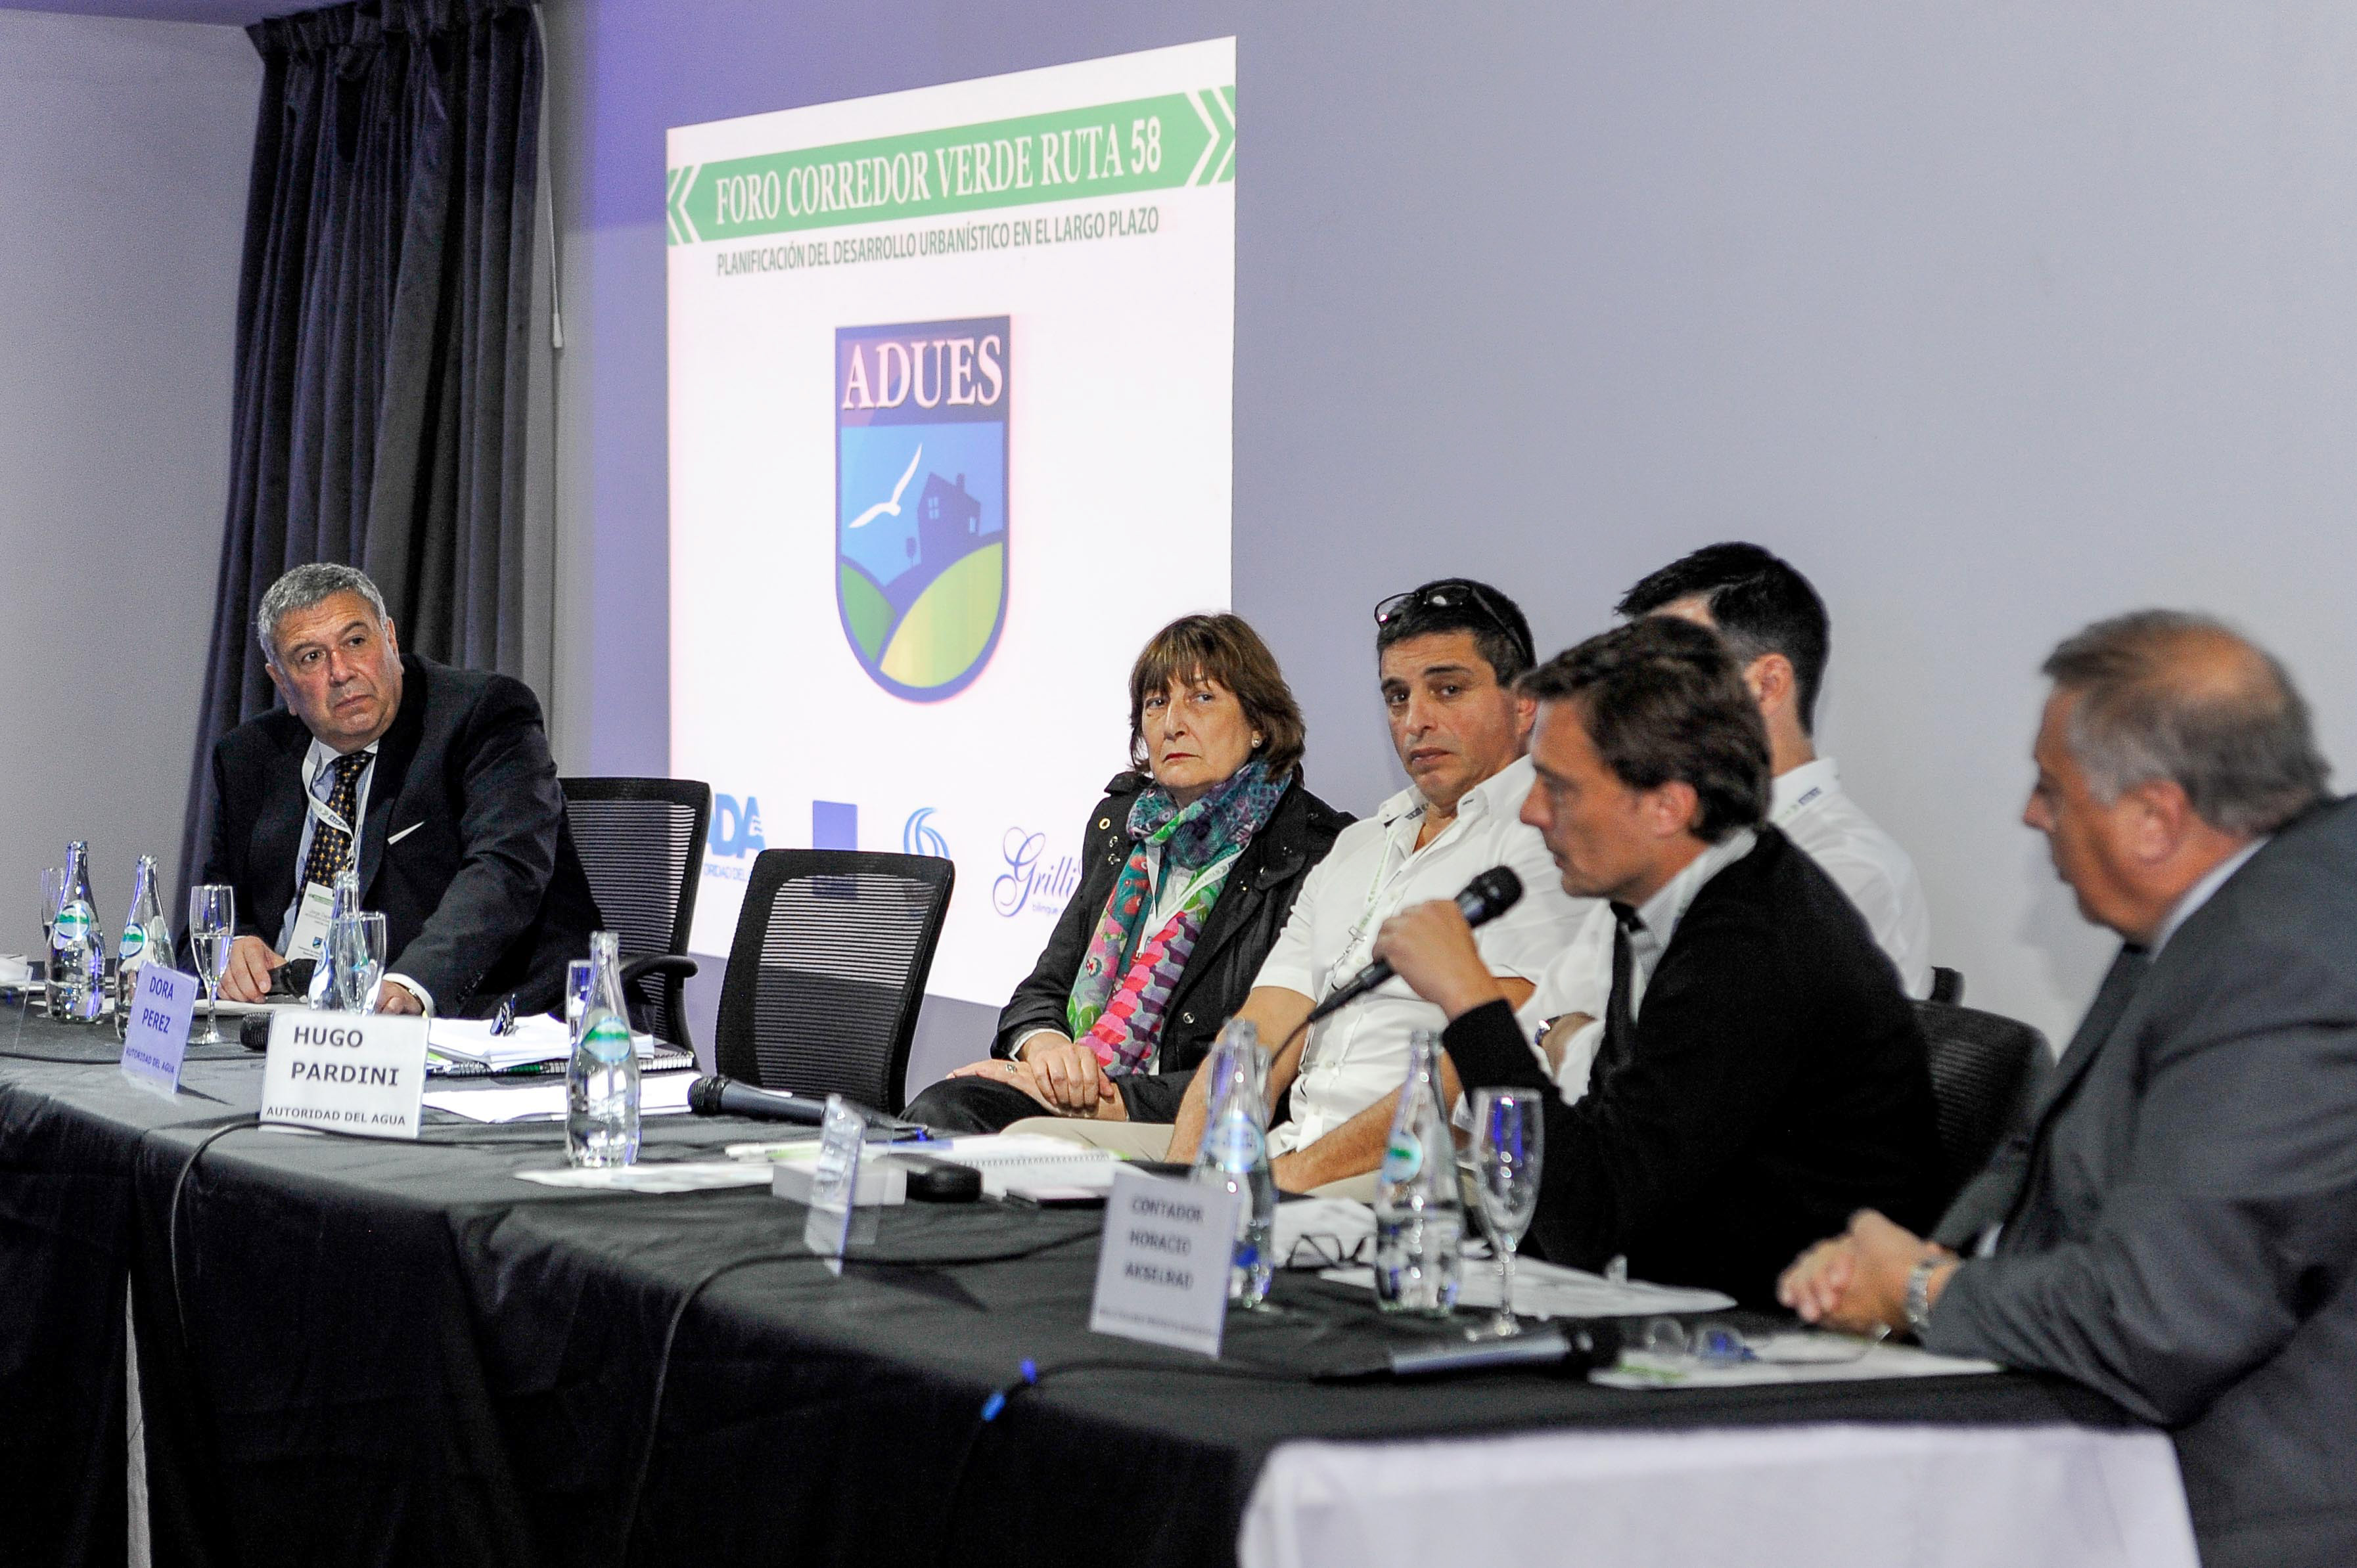 Conclusiones del Foro «Corredor Verde RP 58»